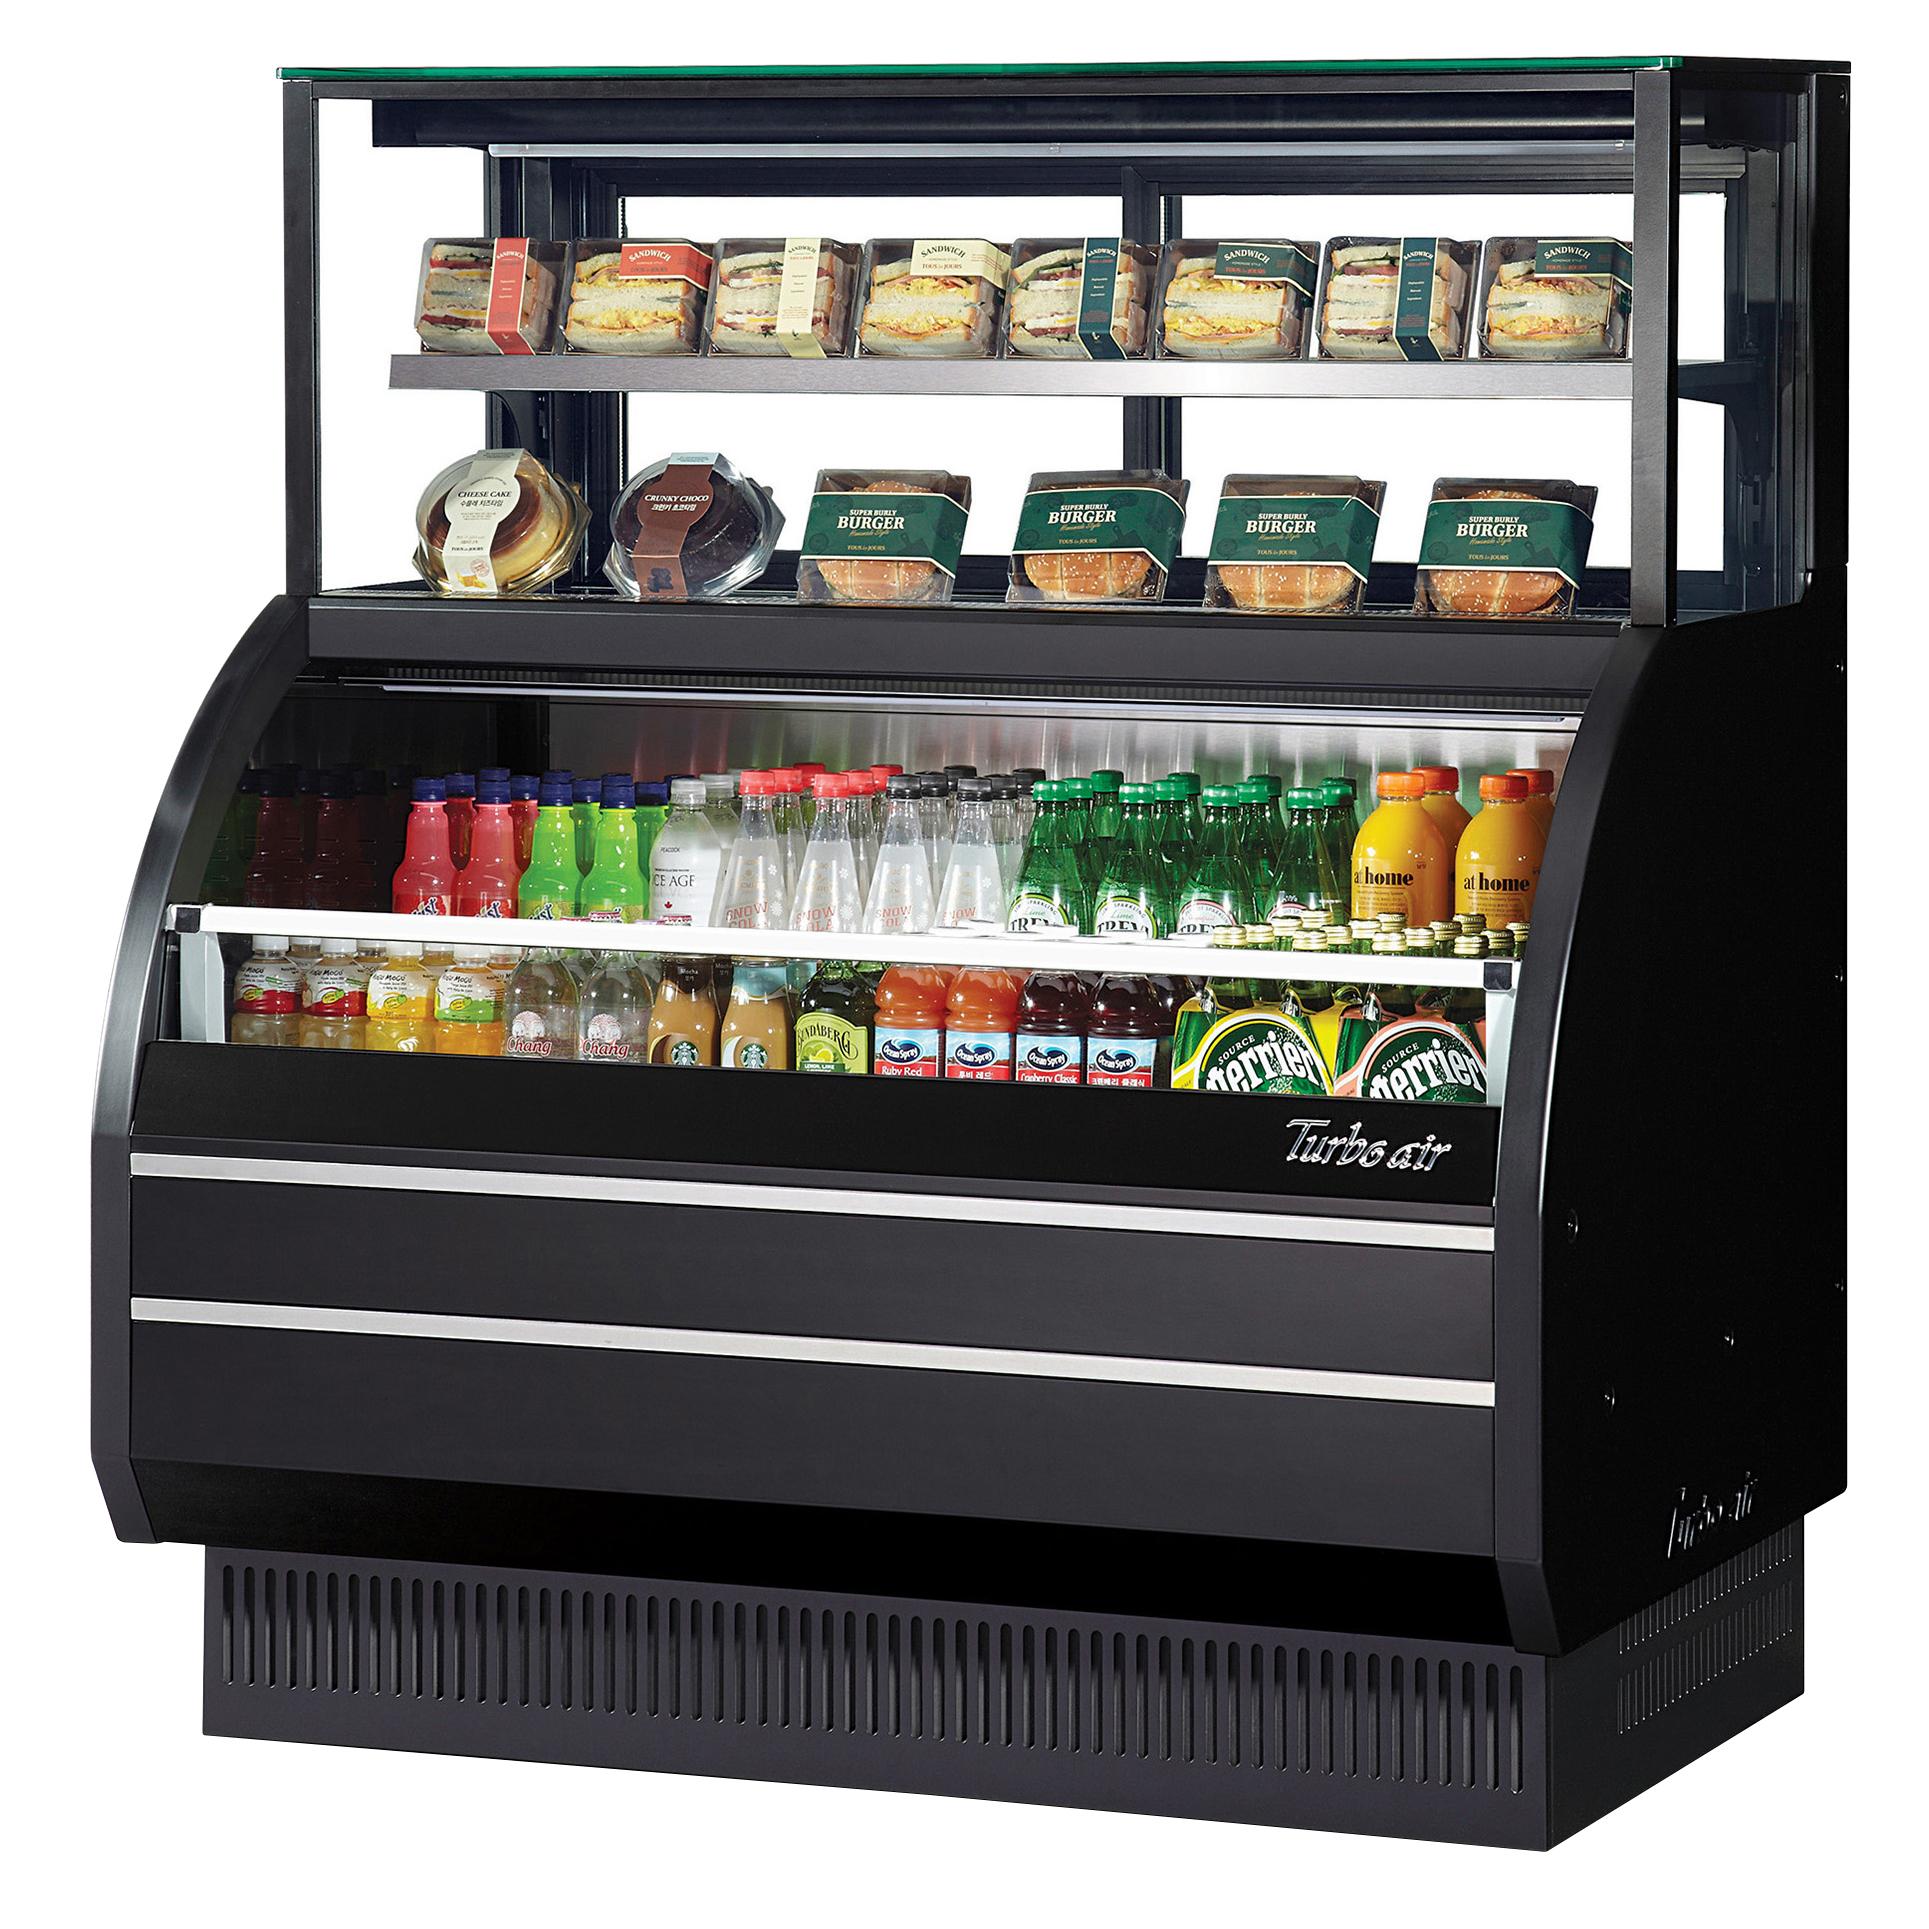 Turbo Air TOM-W-60SB-UF-N merchandiser, open refrigerated display